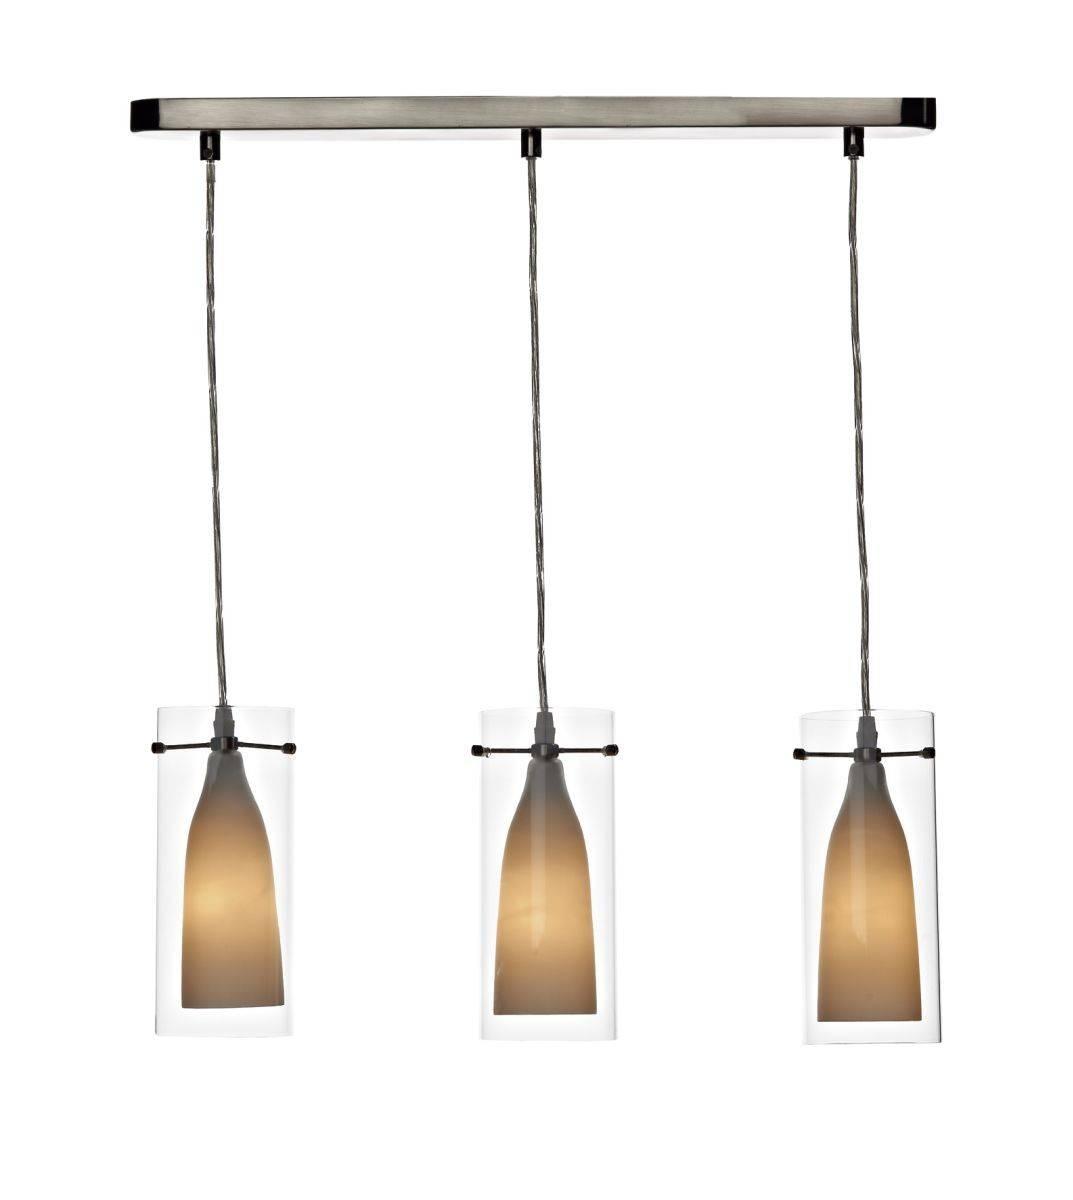 Multi Light Pendants - Baby-Exit regarding Multiple Pendant Lighting Fixtures (Image 6 of 15)